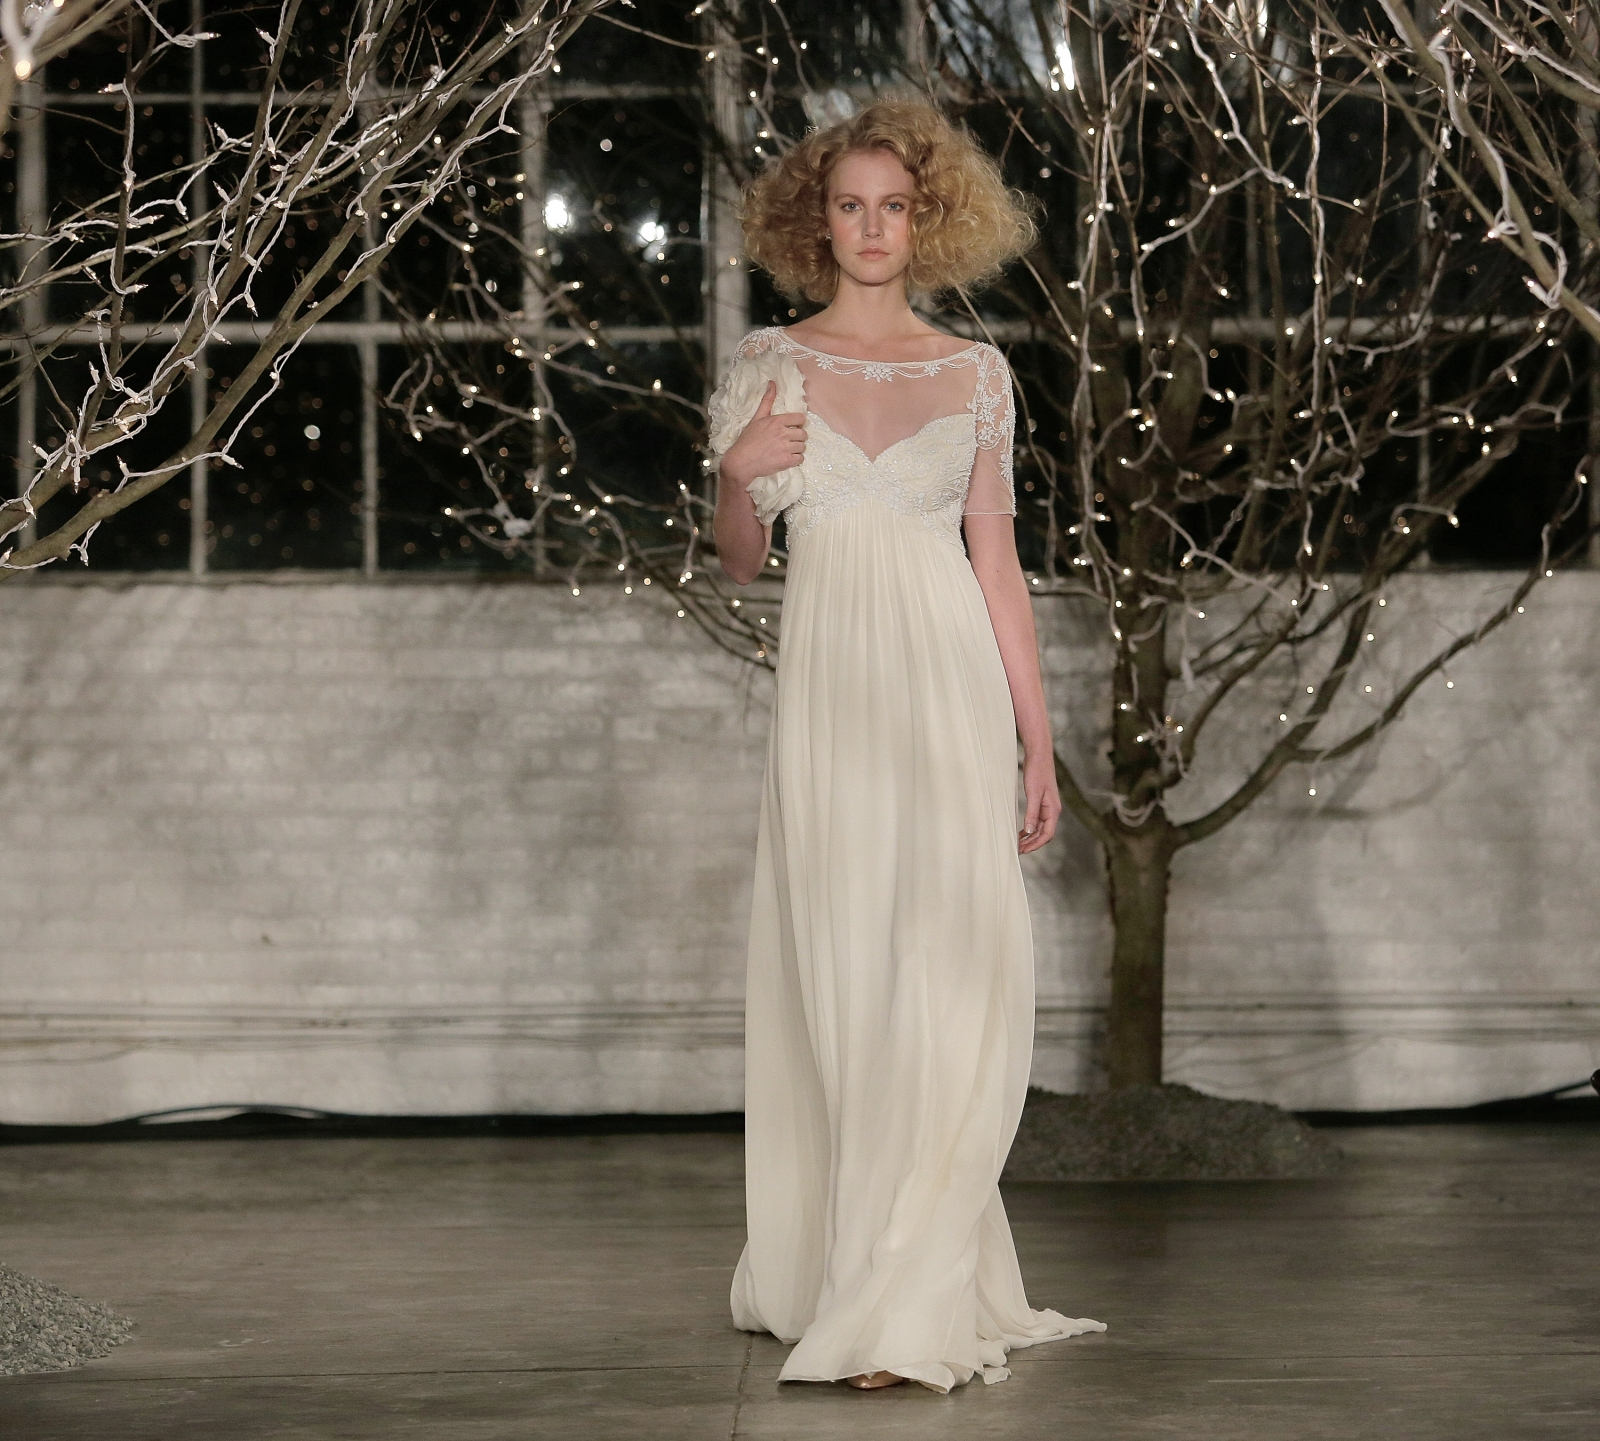 Sears Wedding Guest Dresses